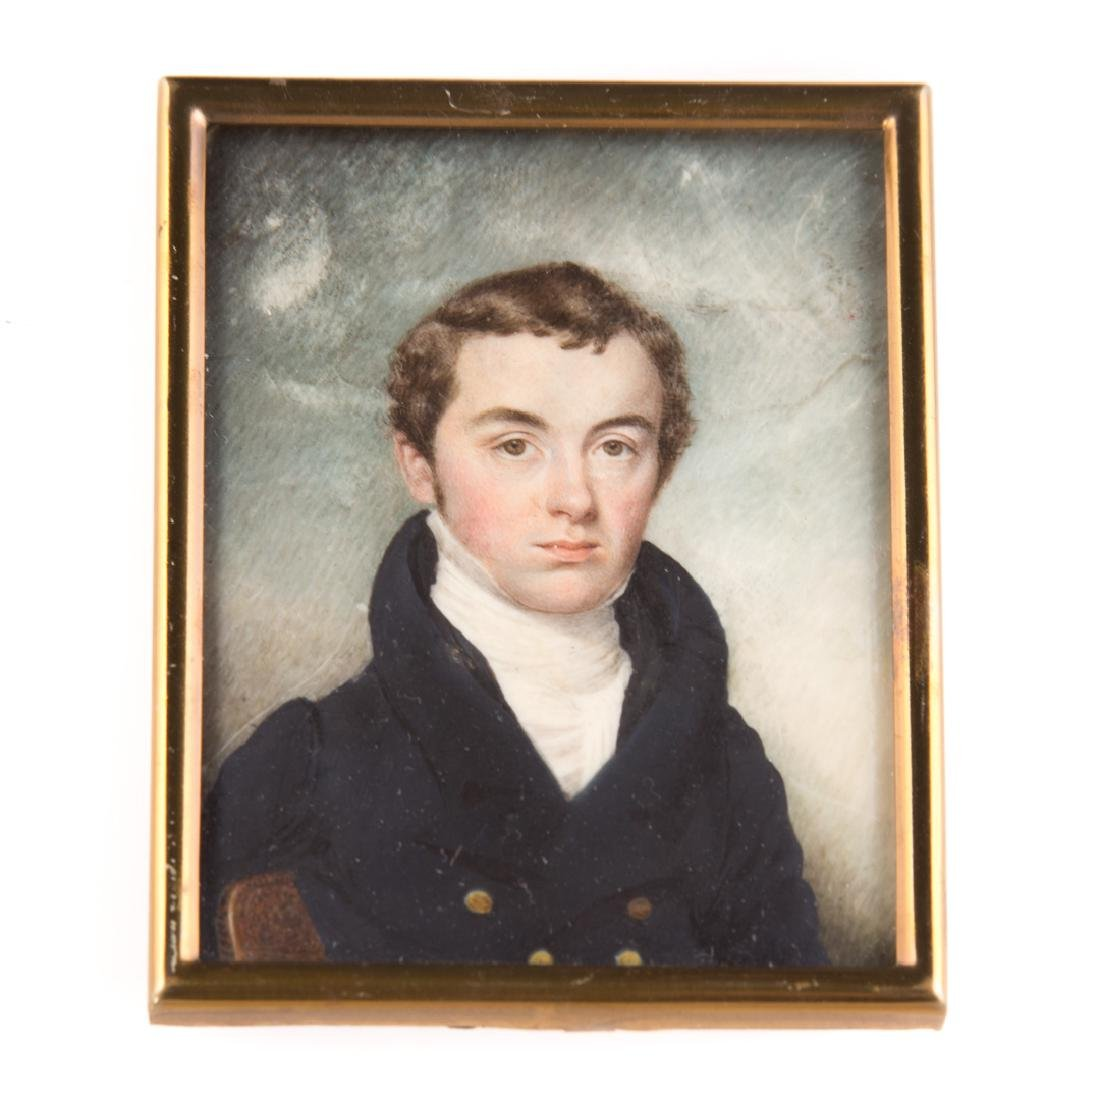 Attributed to Eliza Goodridge, miniature portrait